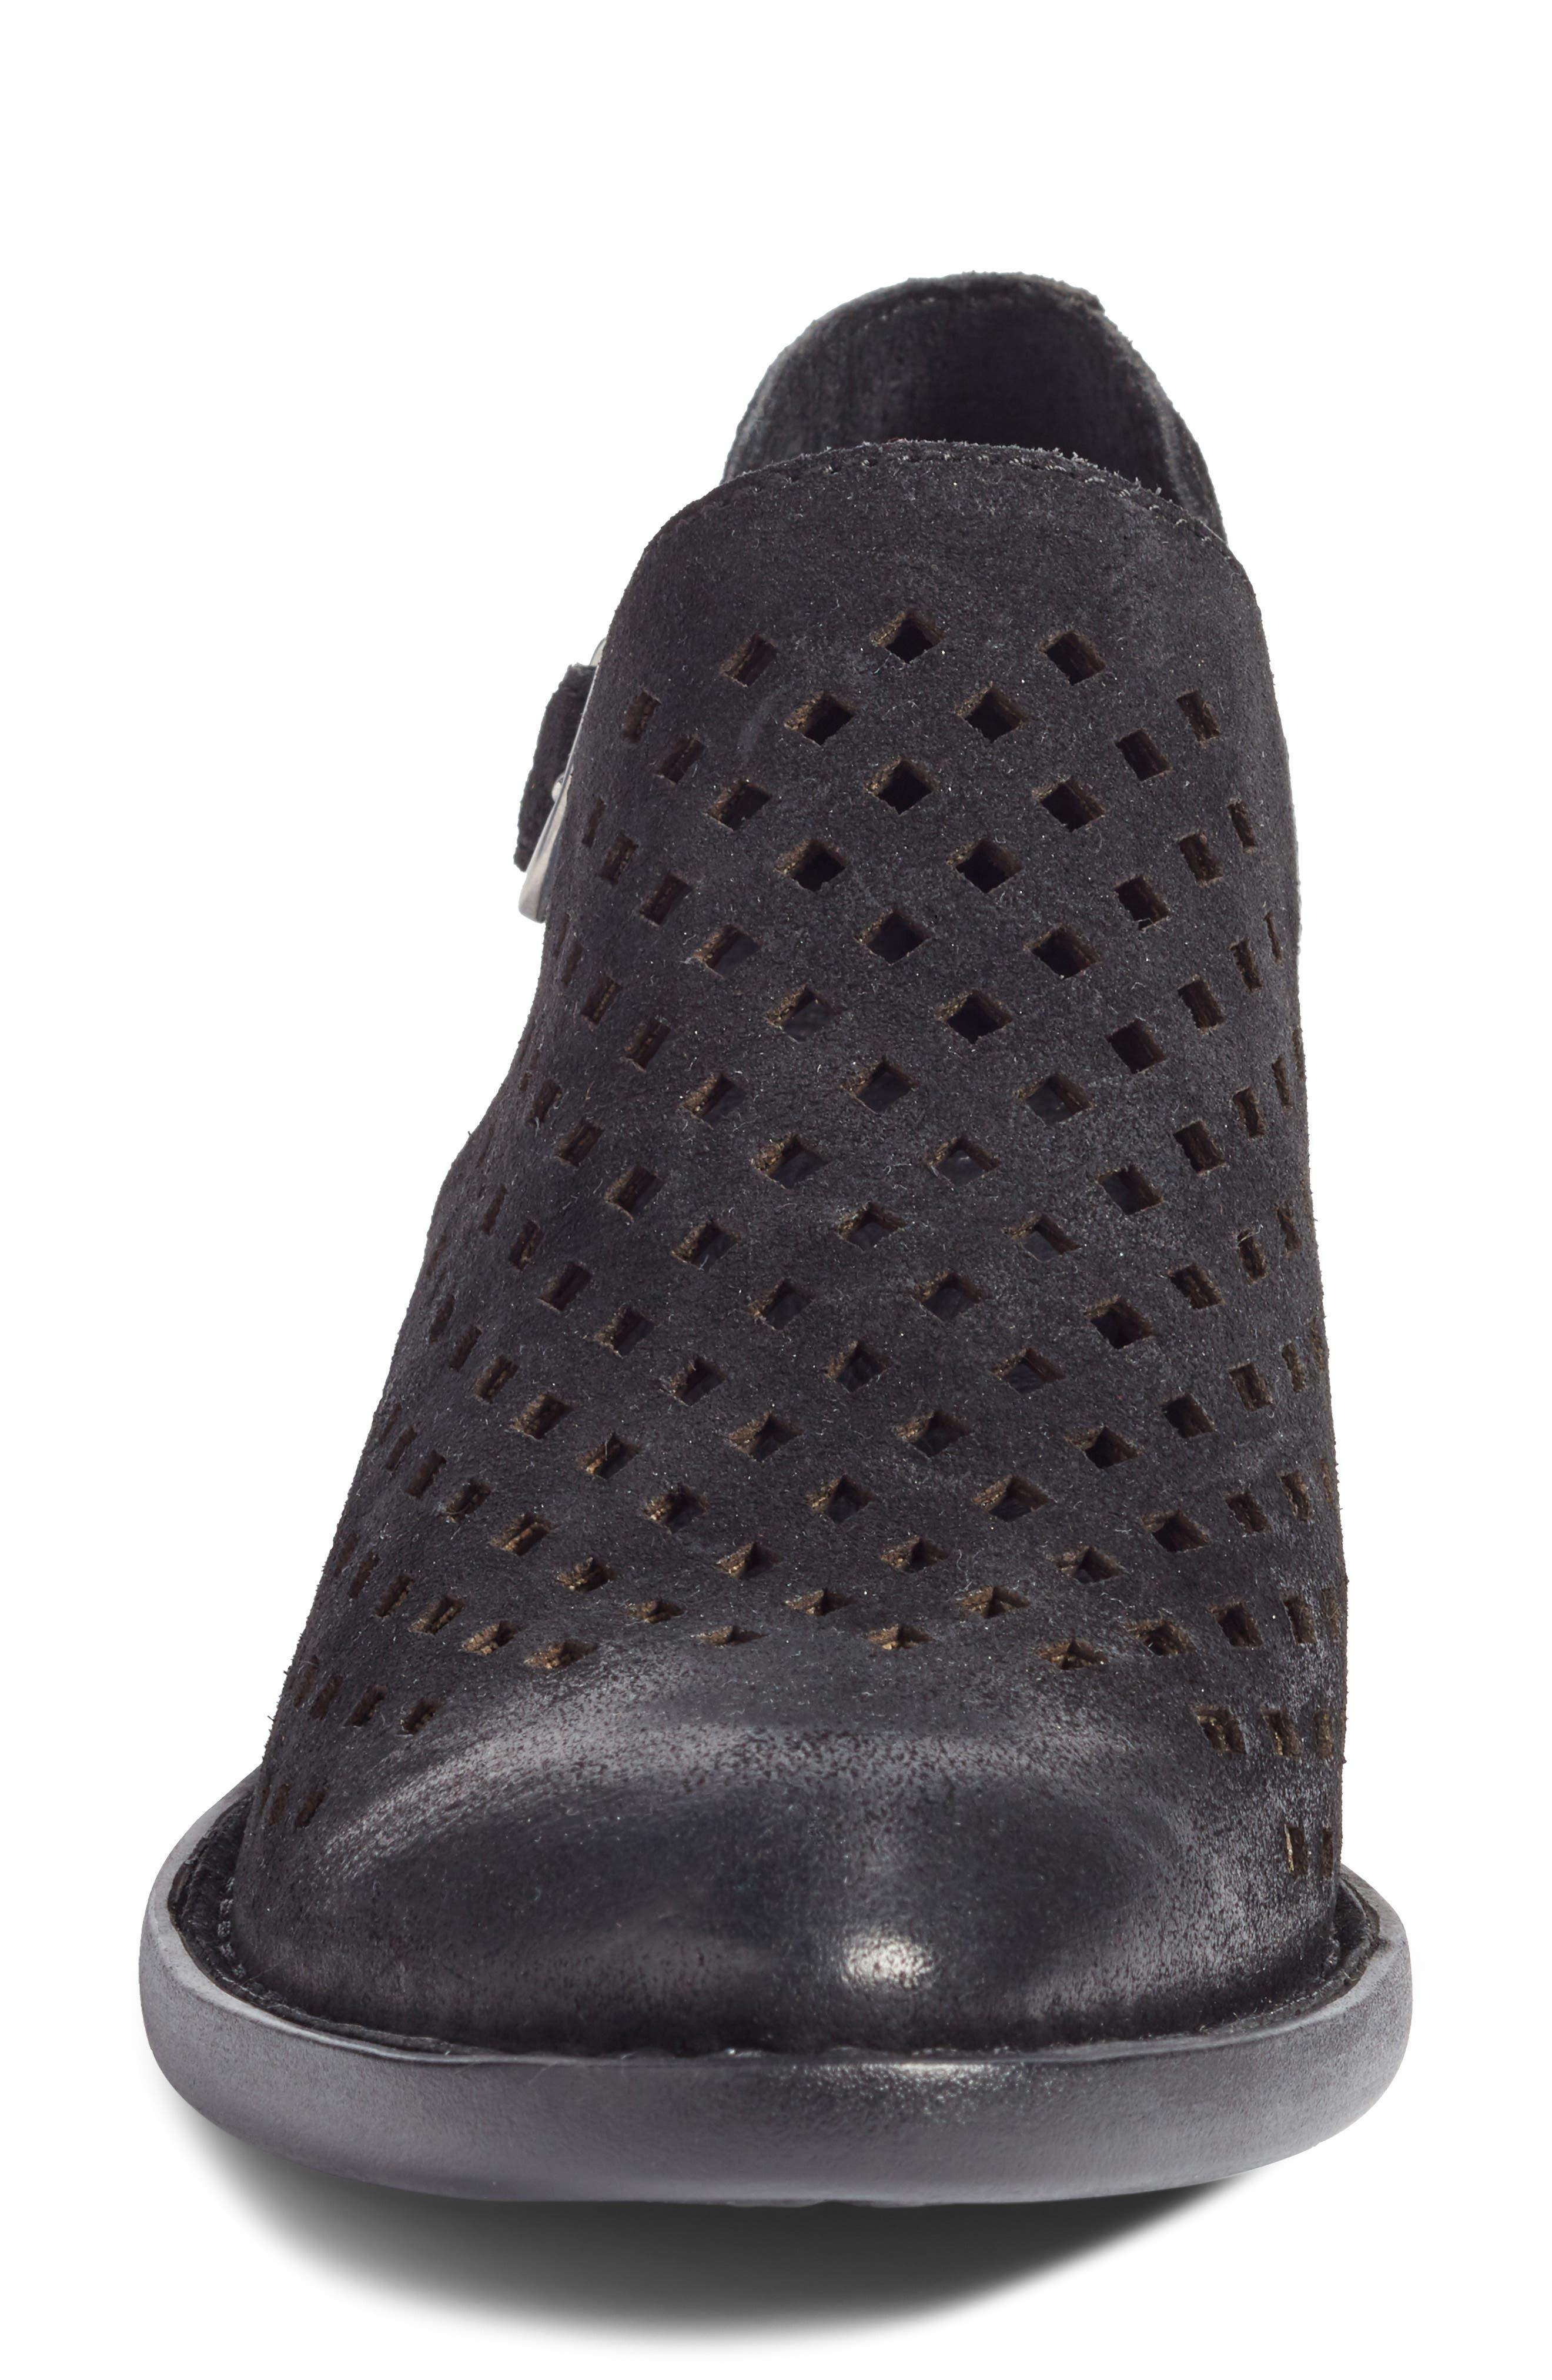 Nanna Bootie,                             Alternate thumbnail 4, color,                             Black Leather